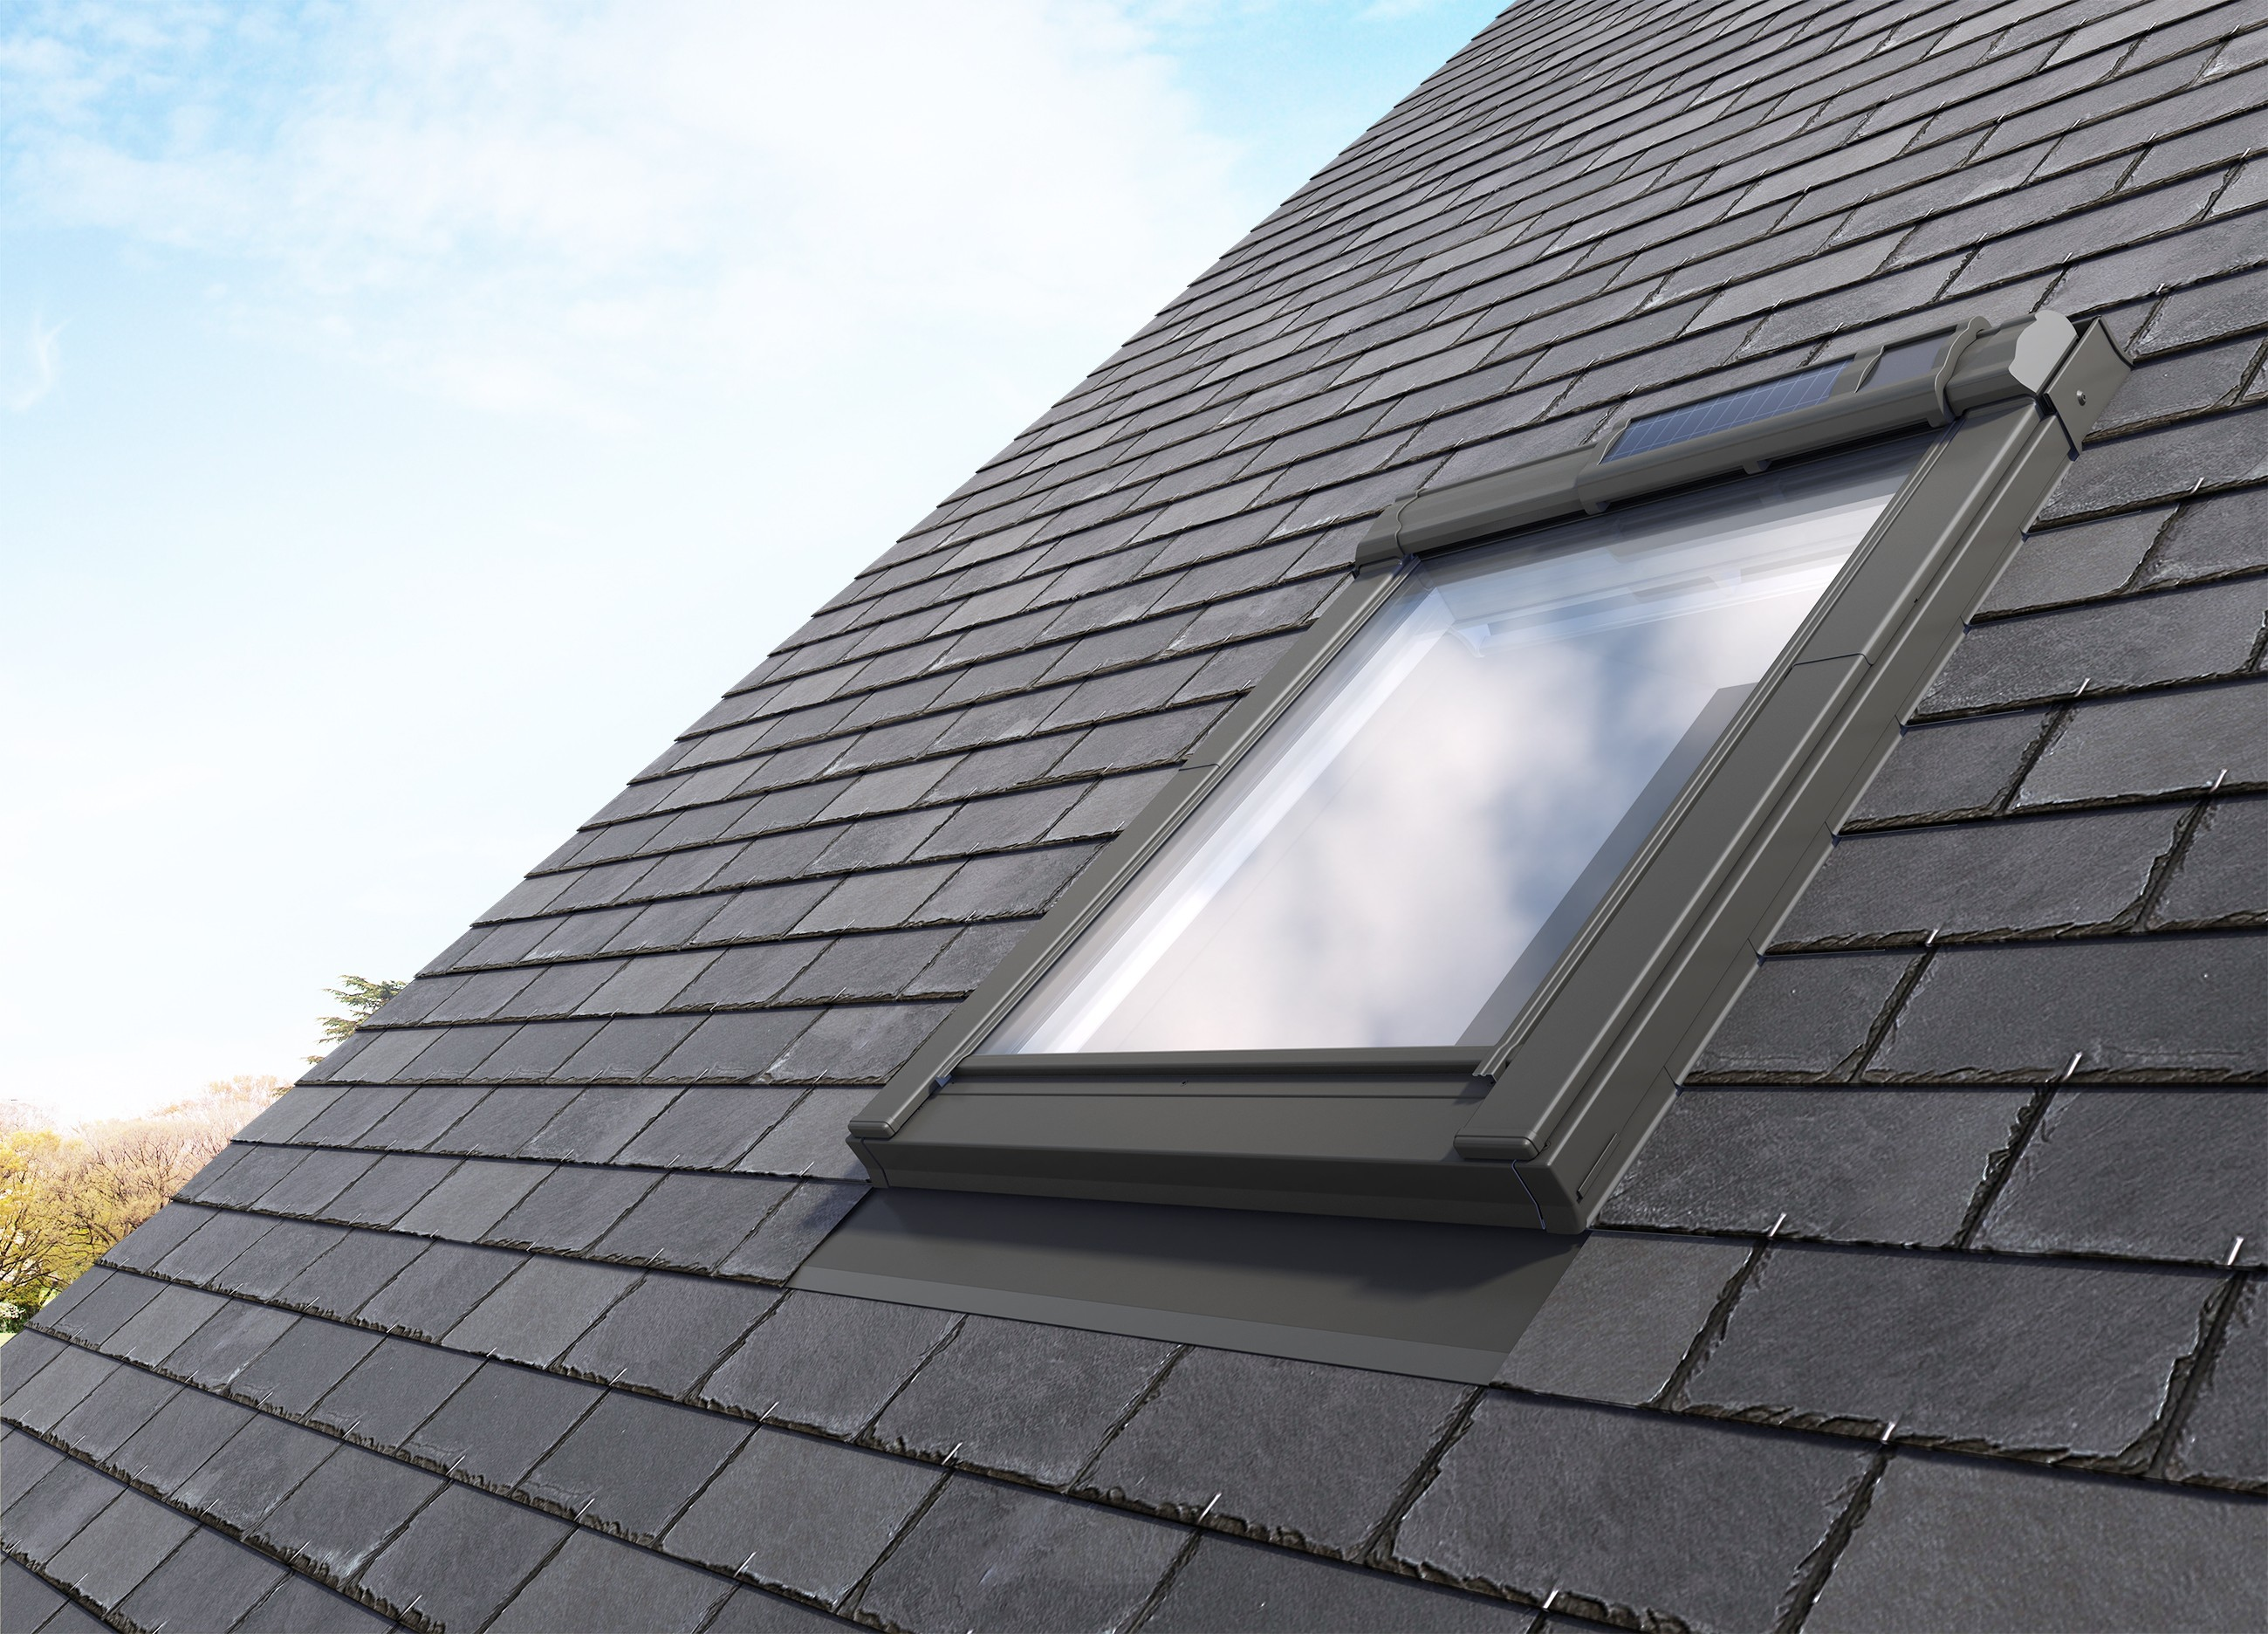 KEYLITE - Solar Roof Lights